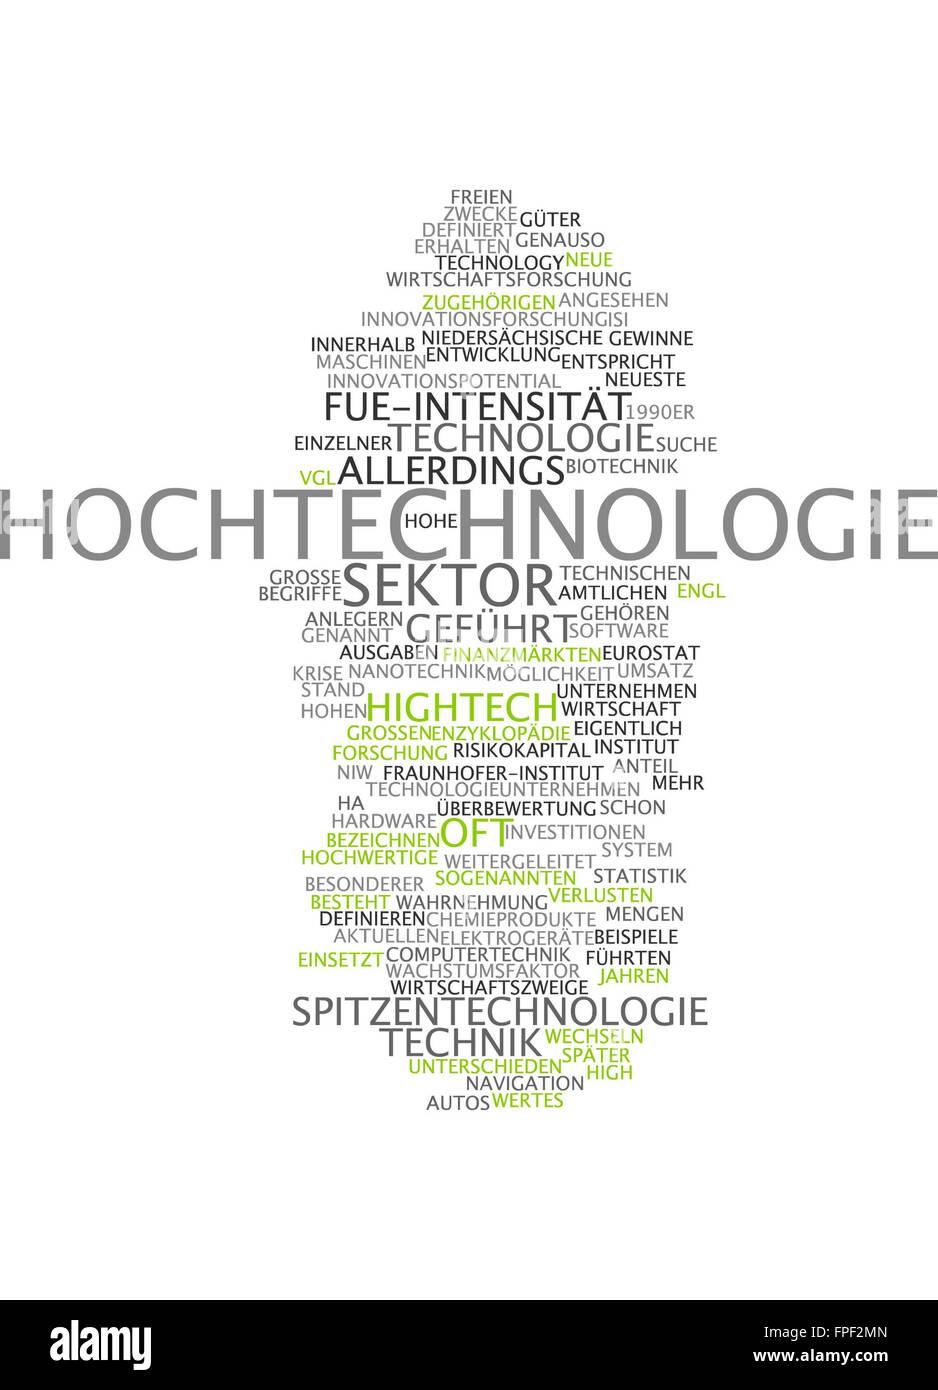 Hochtechnologie-Hightech-Technik-Techniken Stockbild